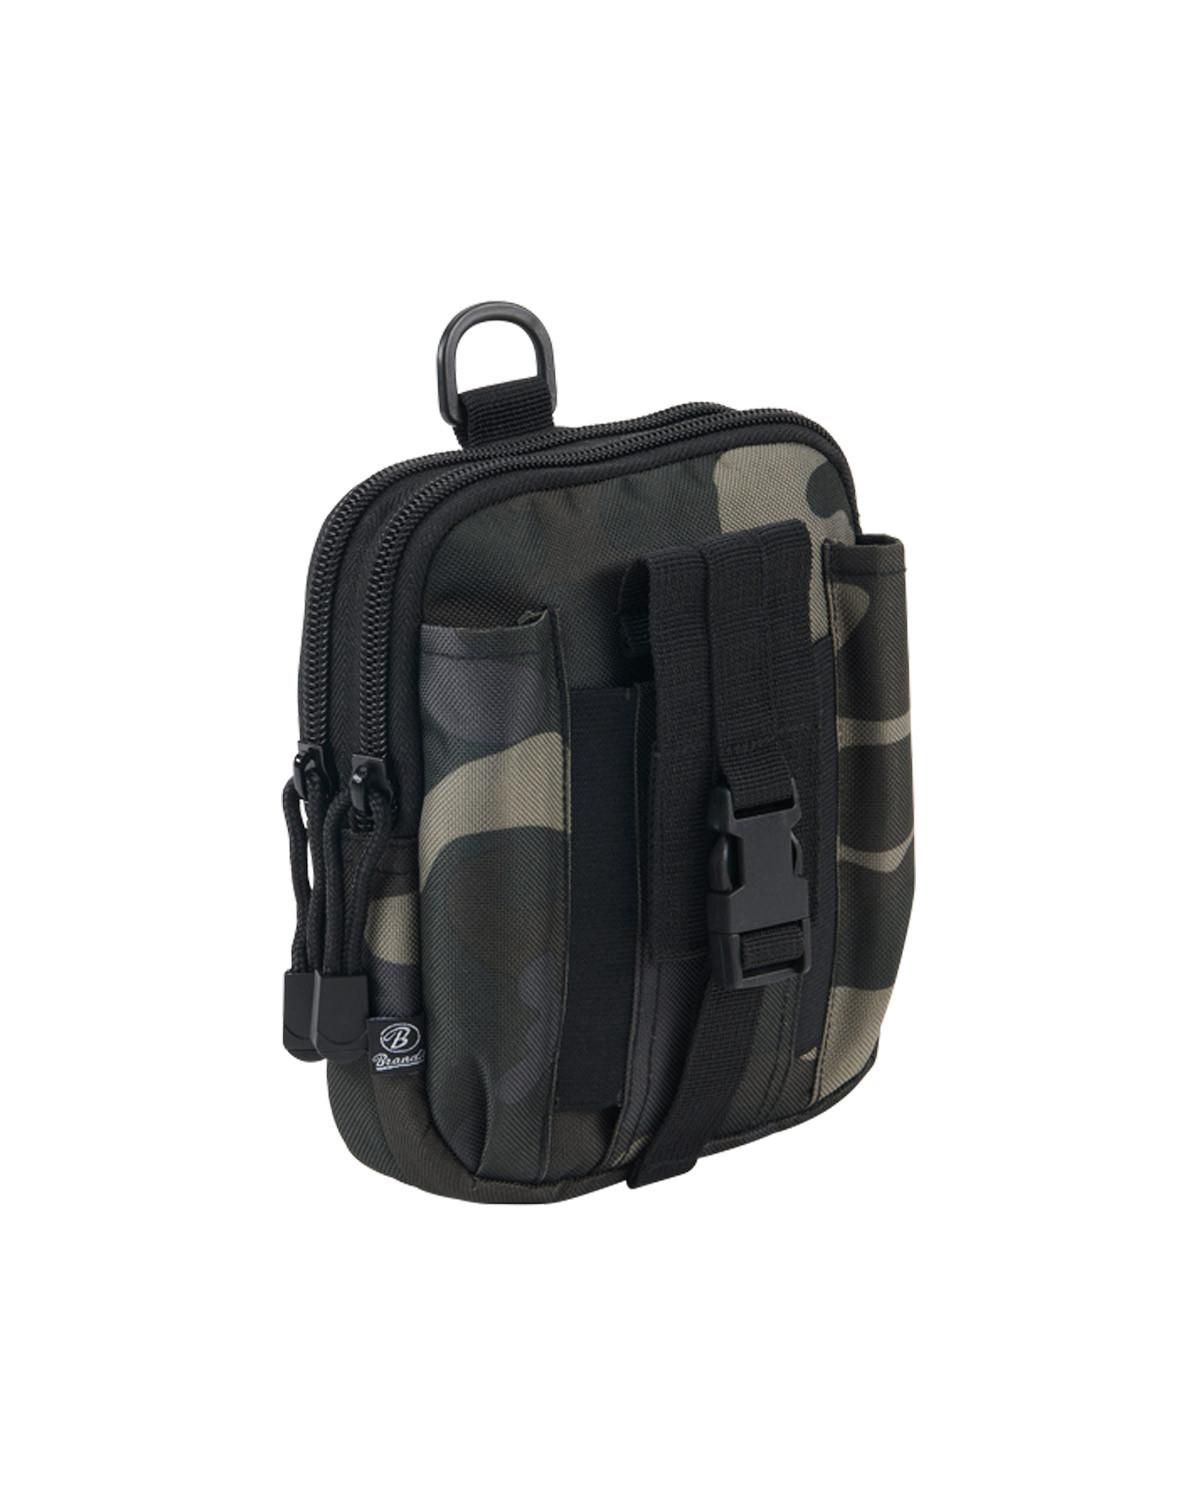 Image of   Brandit Multi Funktionel MOLLE Pouch (Dark Camo, One Size)